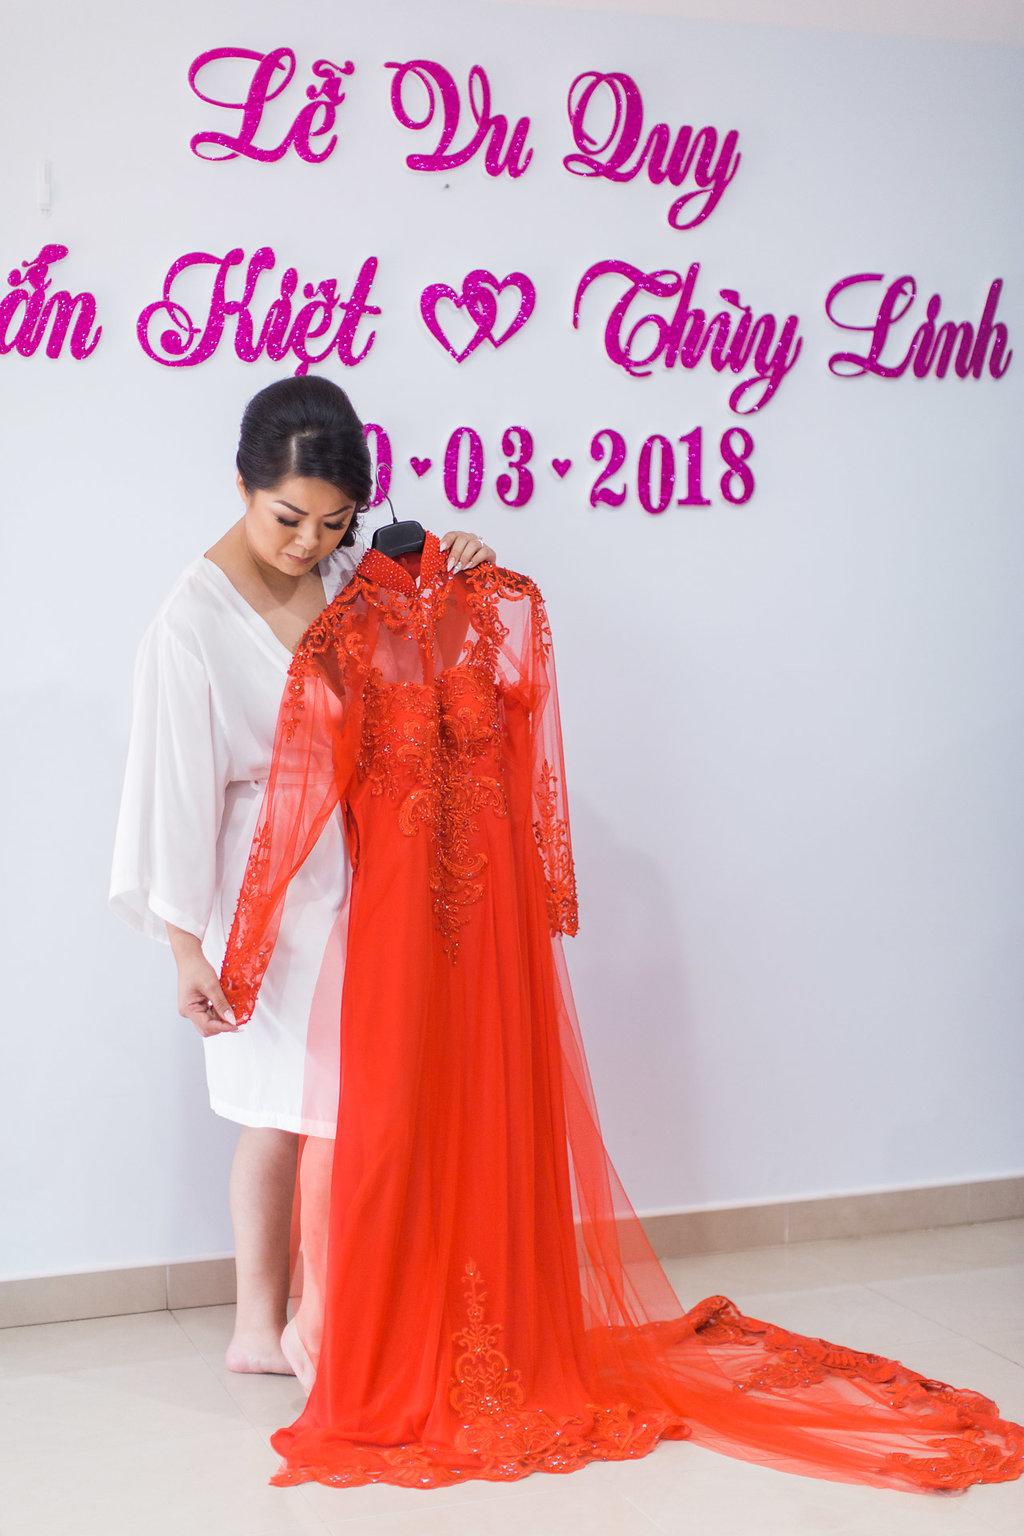 Linh and Kiet Photo 50